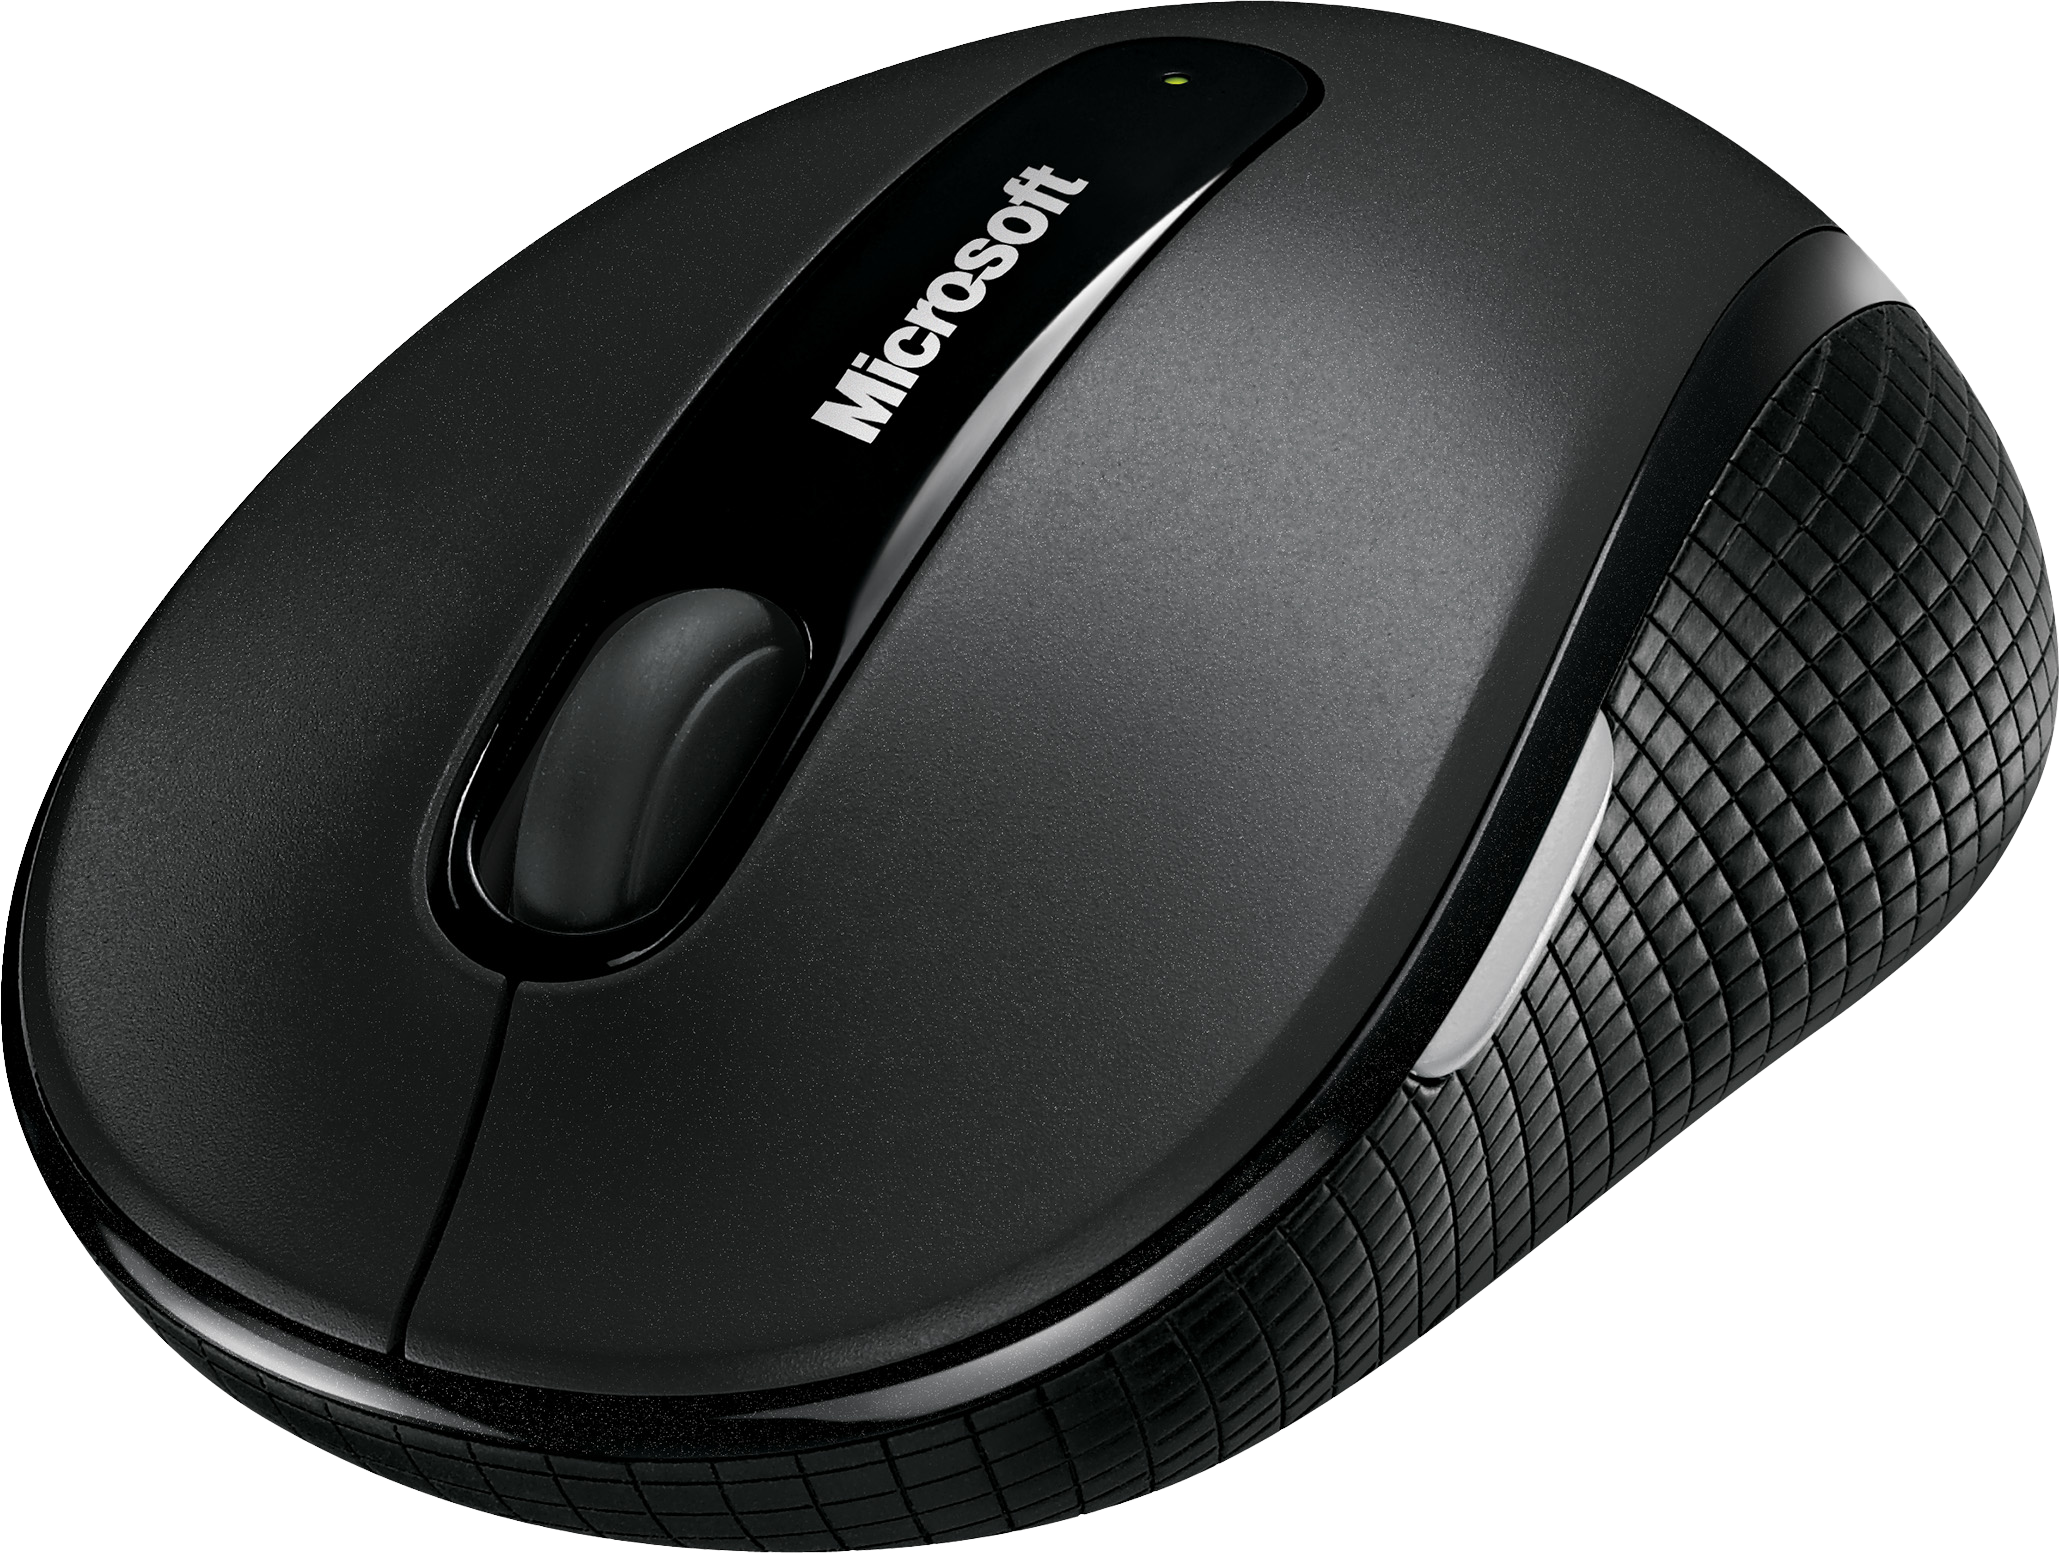 Wireless Mobile Mouse 4000 (Graphite)